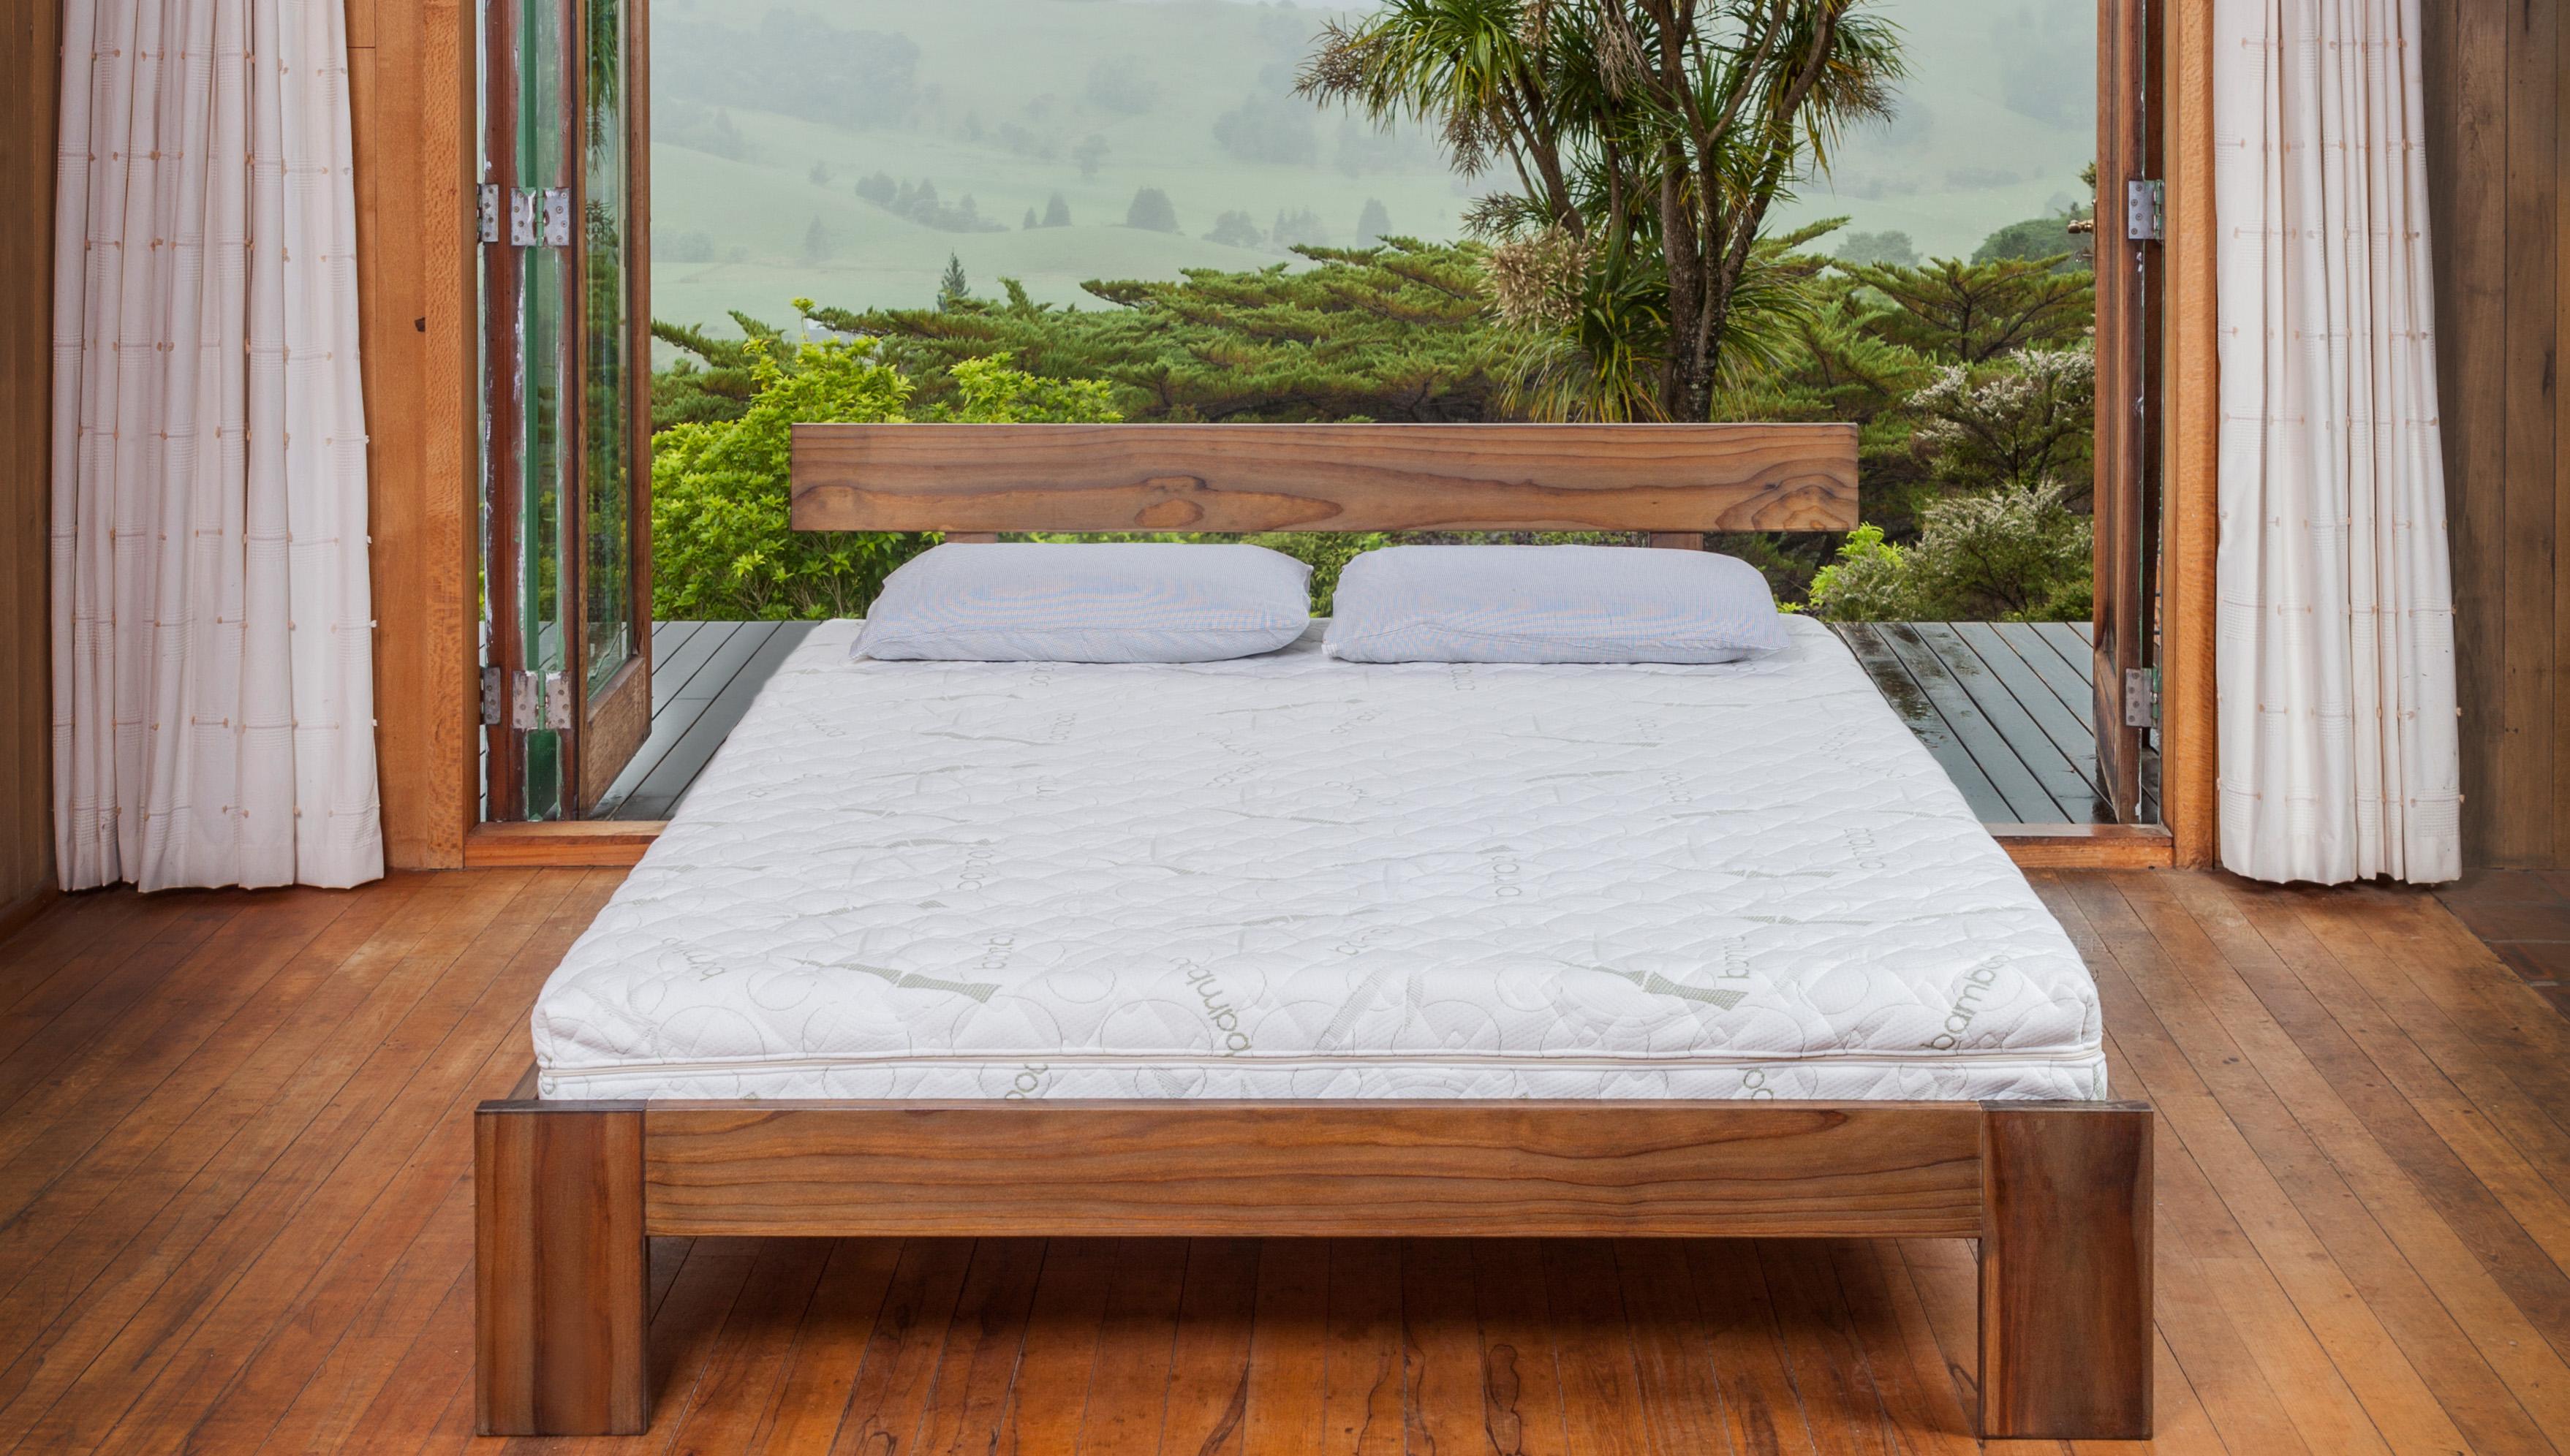 needles wayfair pdx full blazing furniture vitality futon mattress size futons review reviews